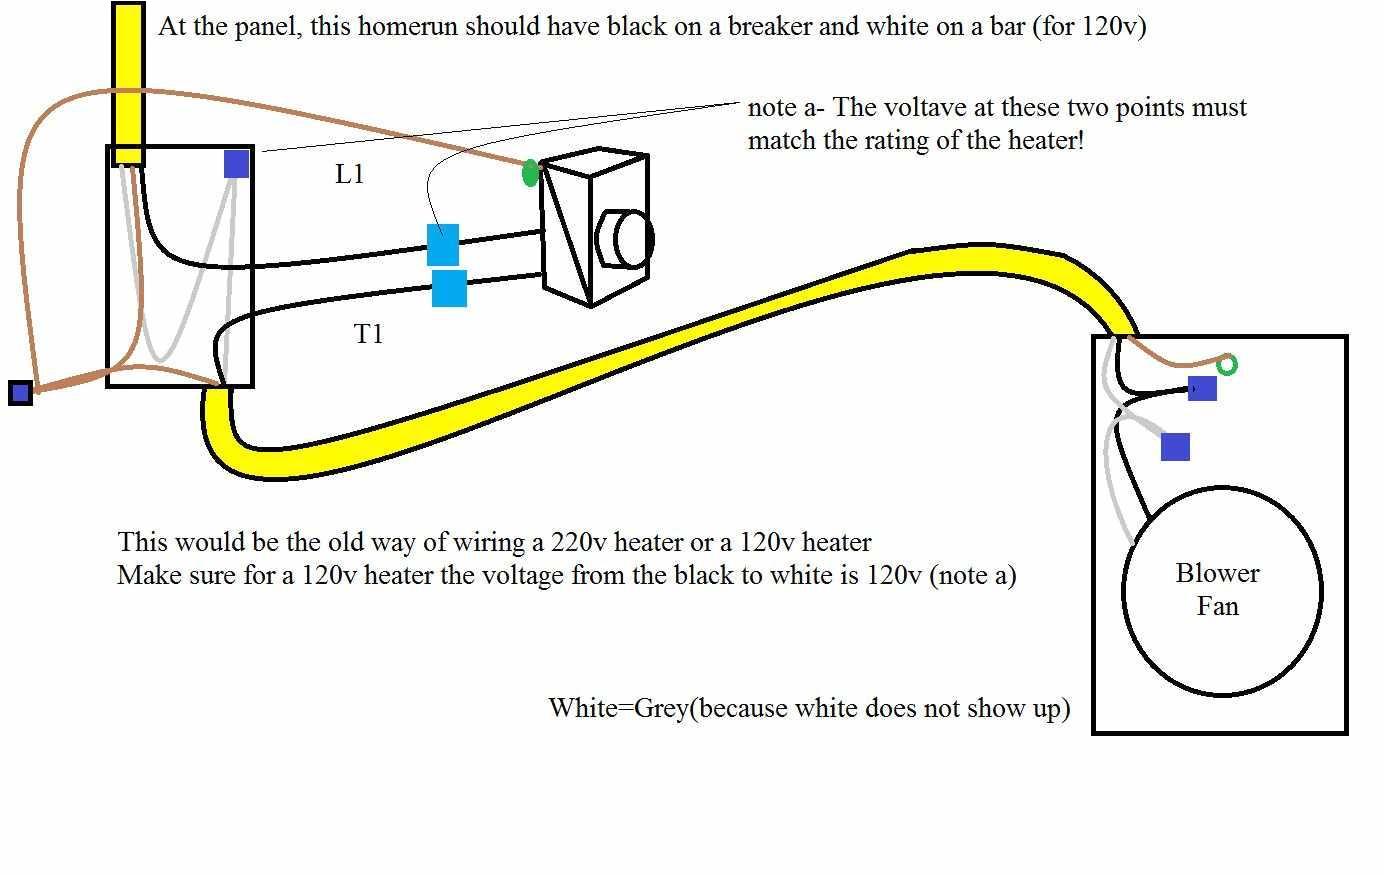 marley thermostat wiring diagram 220 volt wiring diagram centermarley unit heater wiring diagram 240v wiring diagram